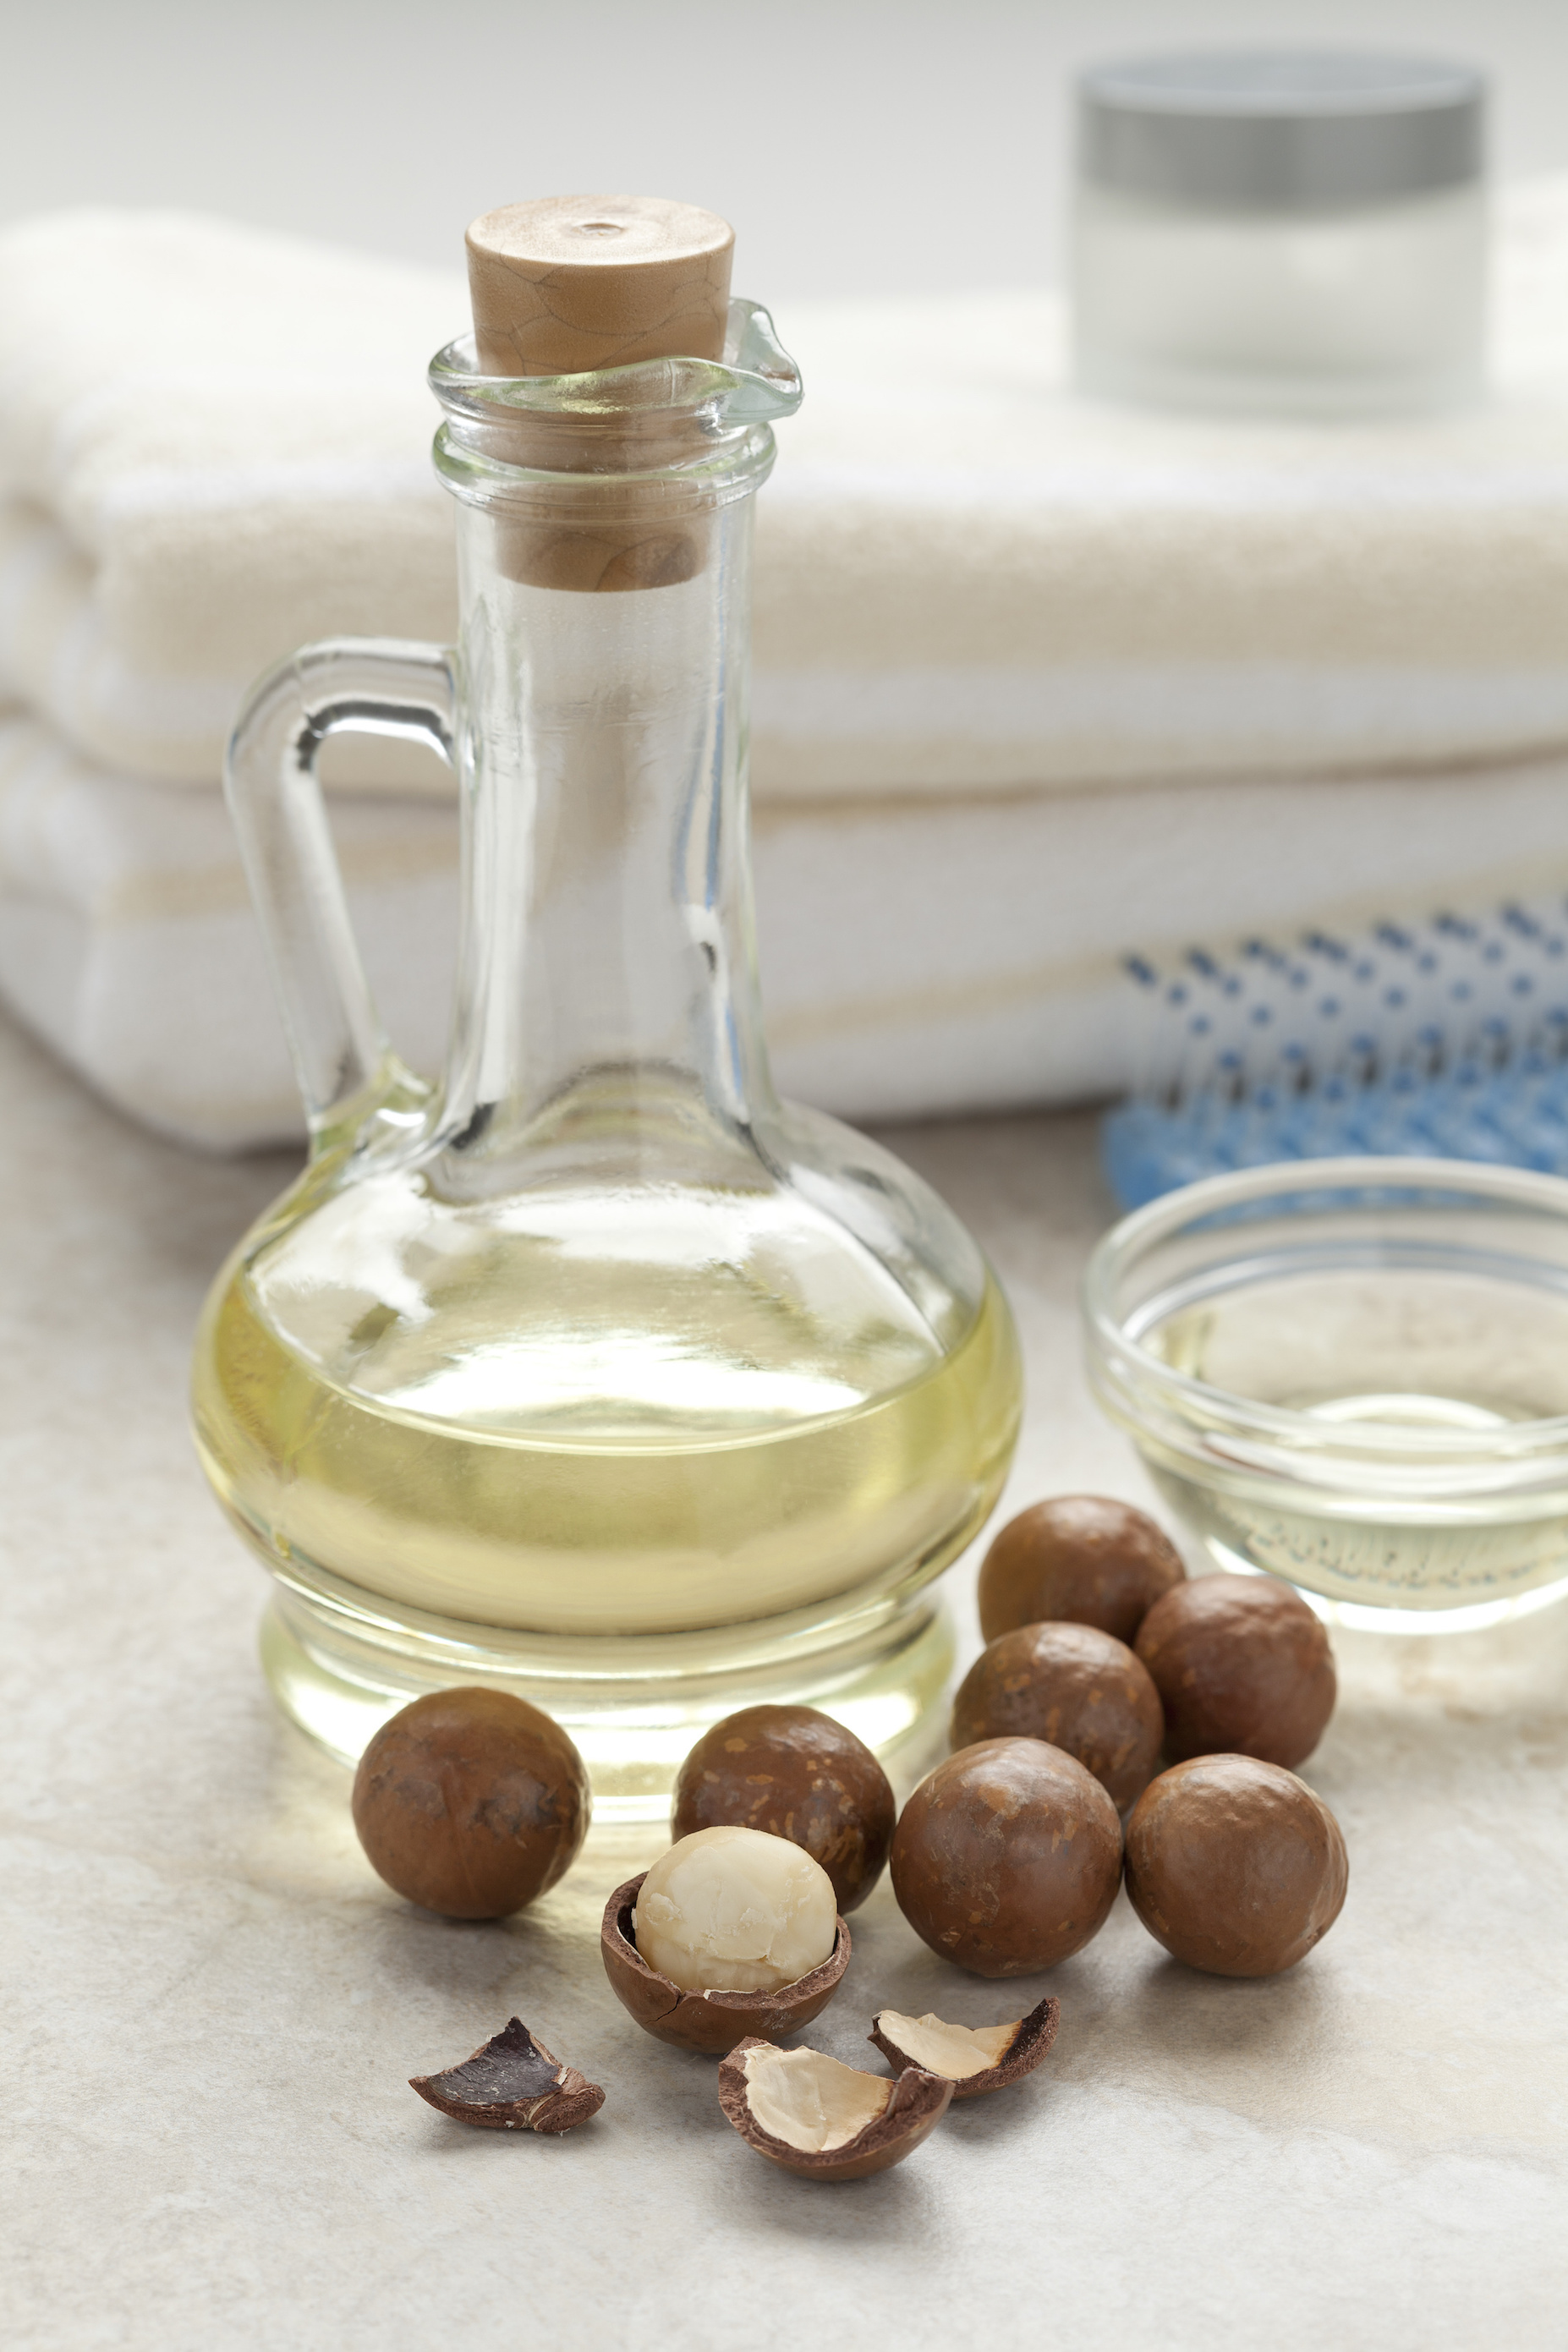 Bottle with macadamia oil